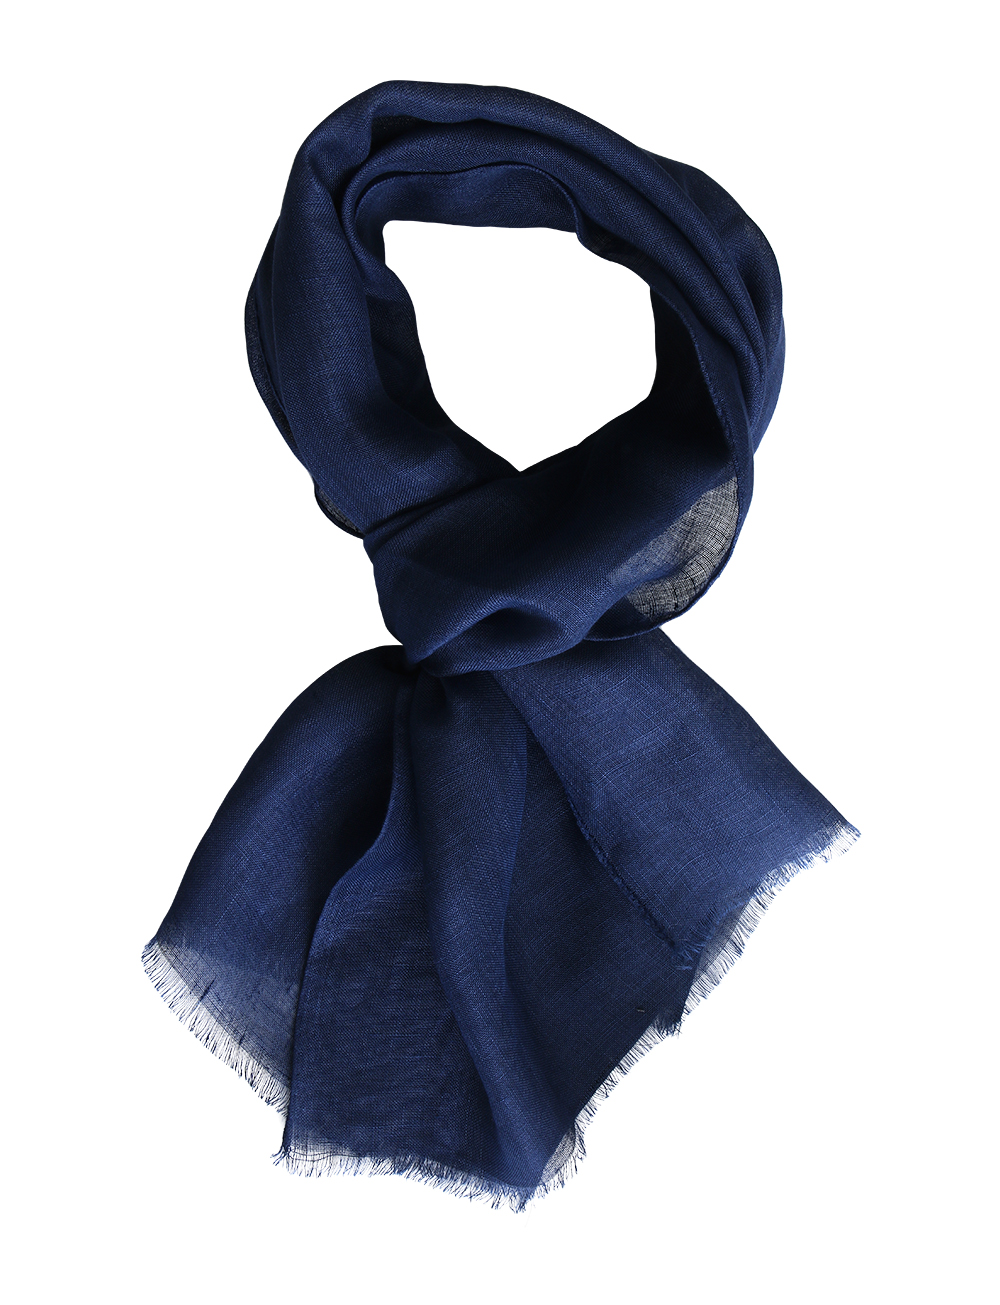 Echarpe unie en lin – bleu marine   Cadot 089c8ba740a